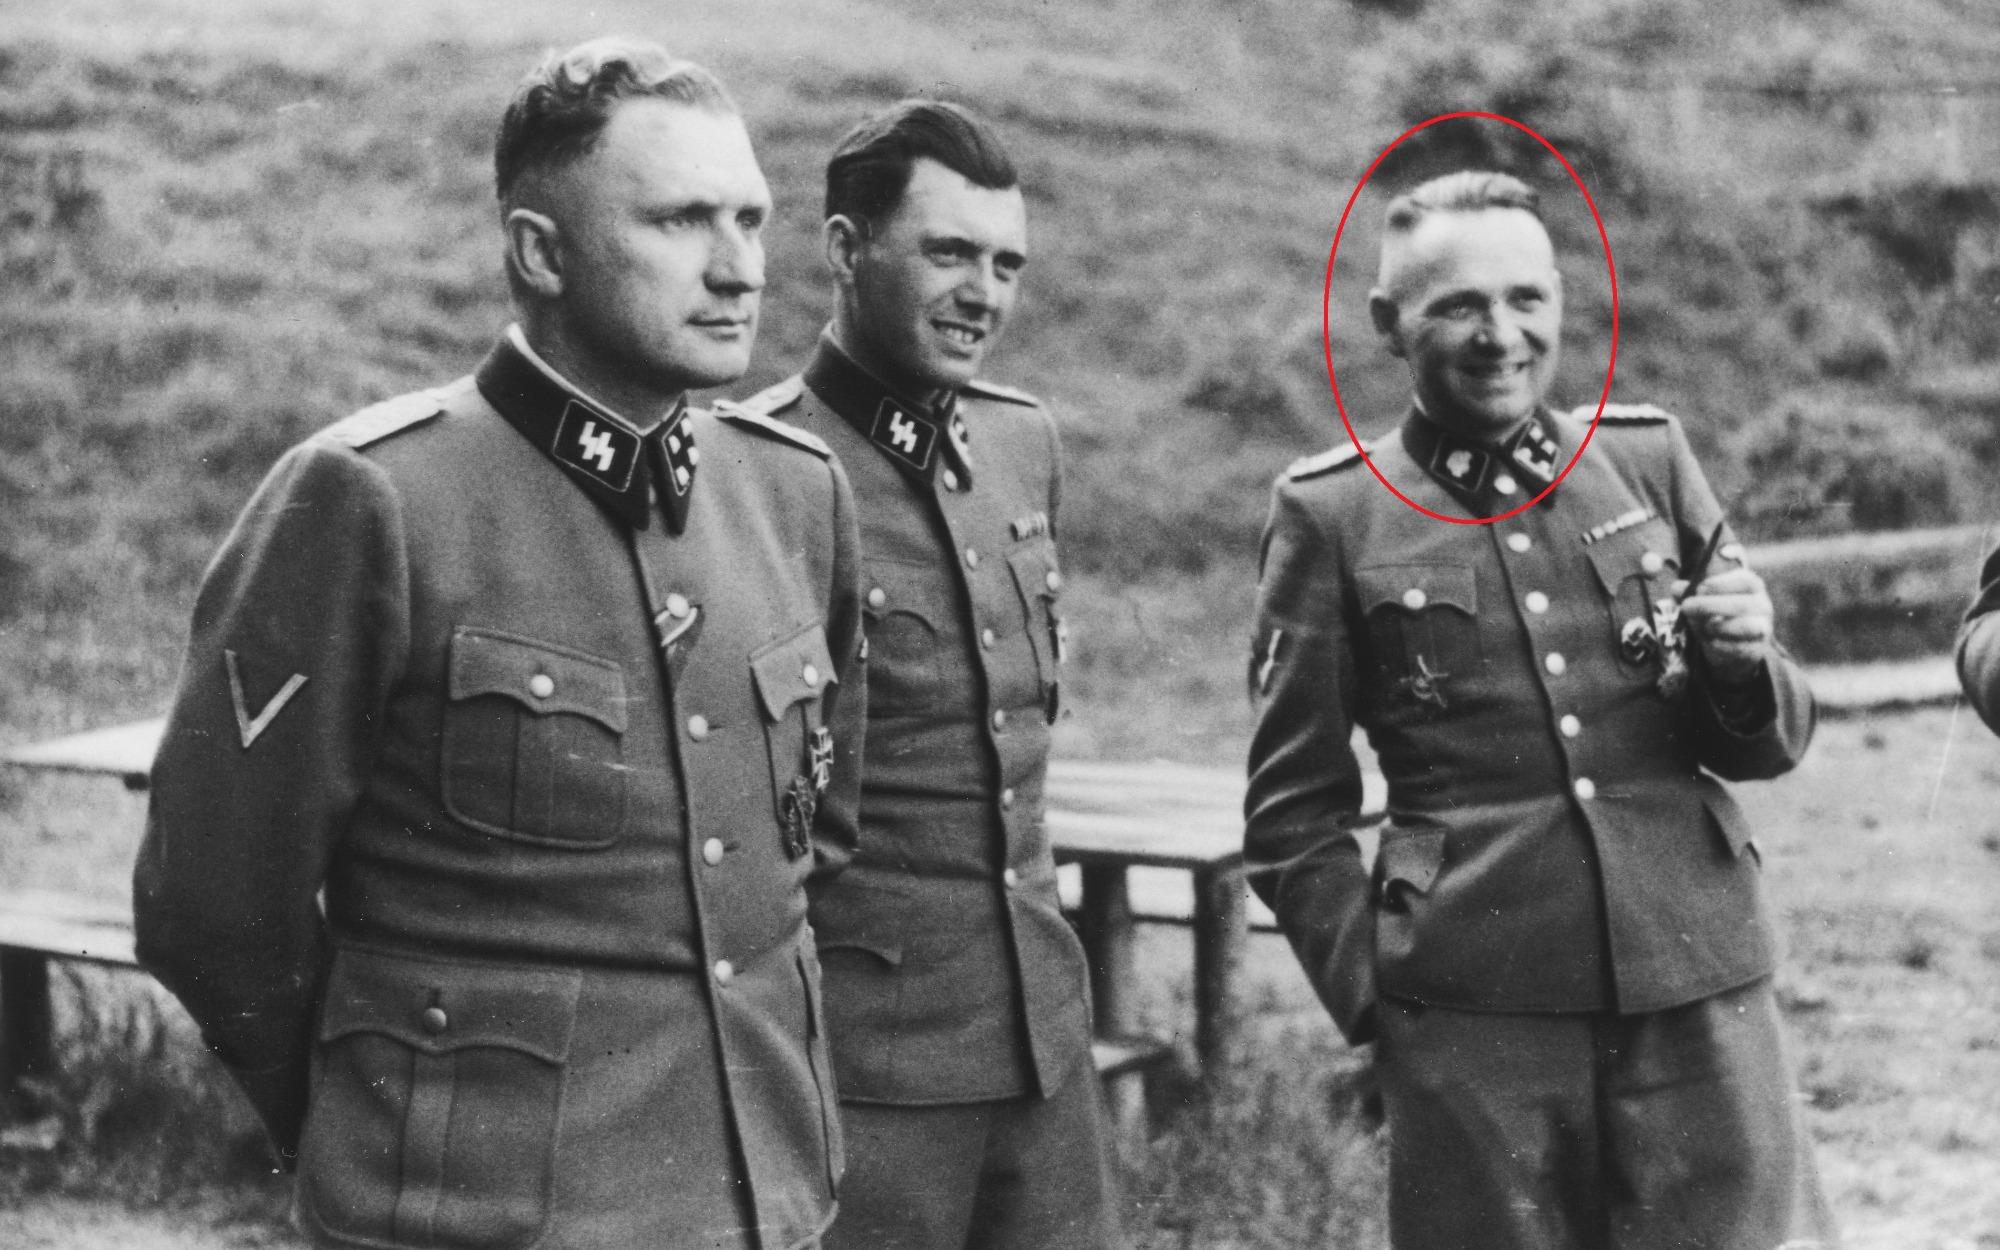 Rudolf Hoess: The Mass Murderer Behind Auschwitz | The National Interest